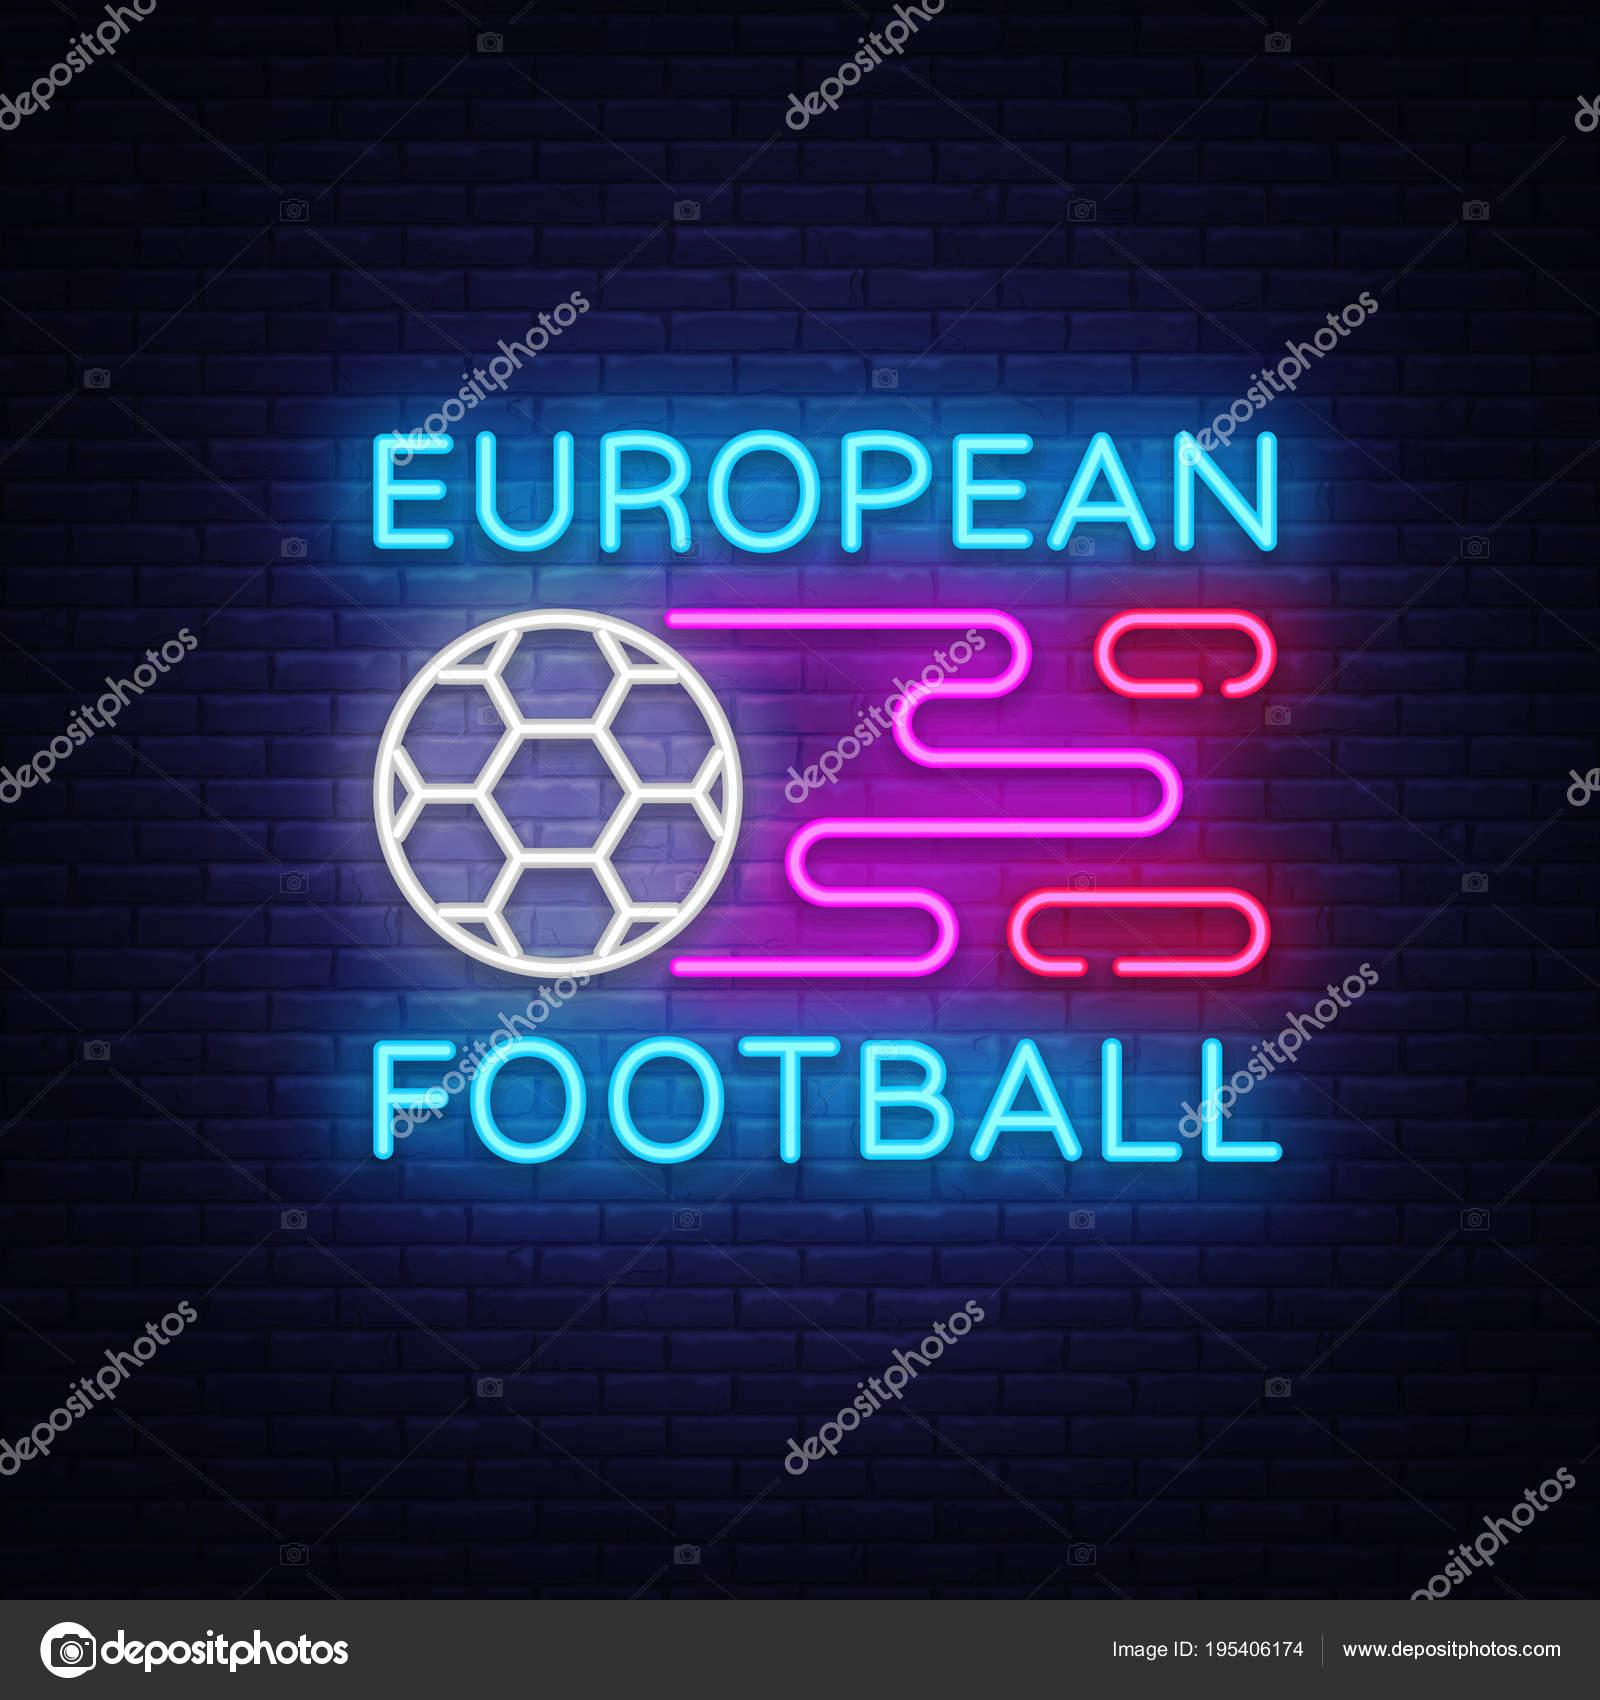 Europaischen Fussball Neon Sign Vektor Fussball Logo Neon